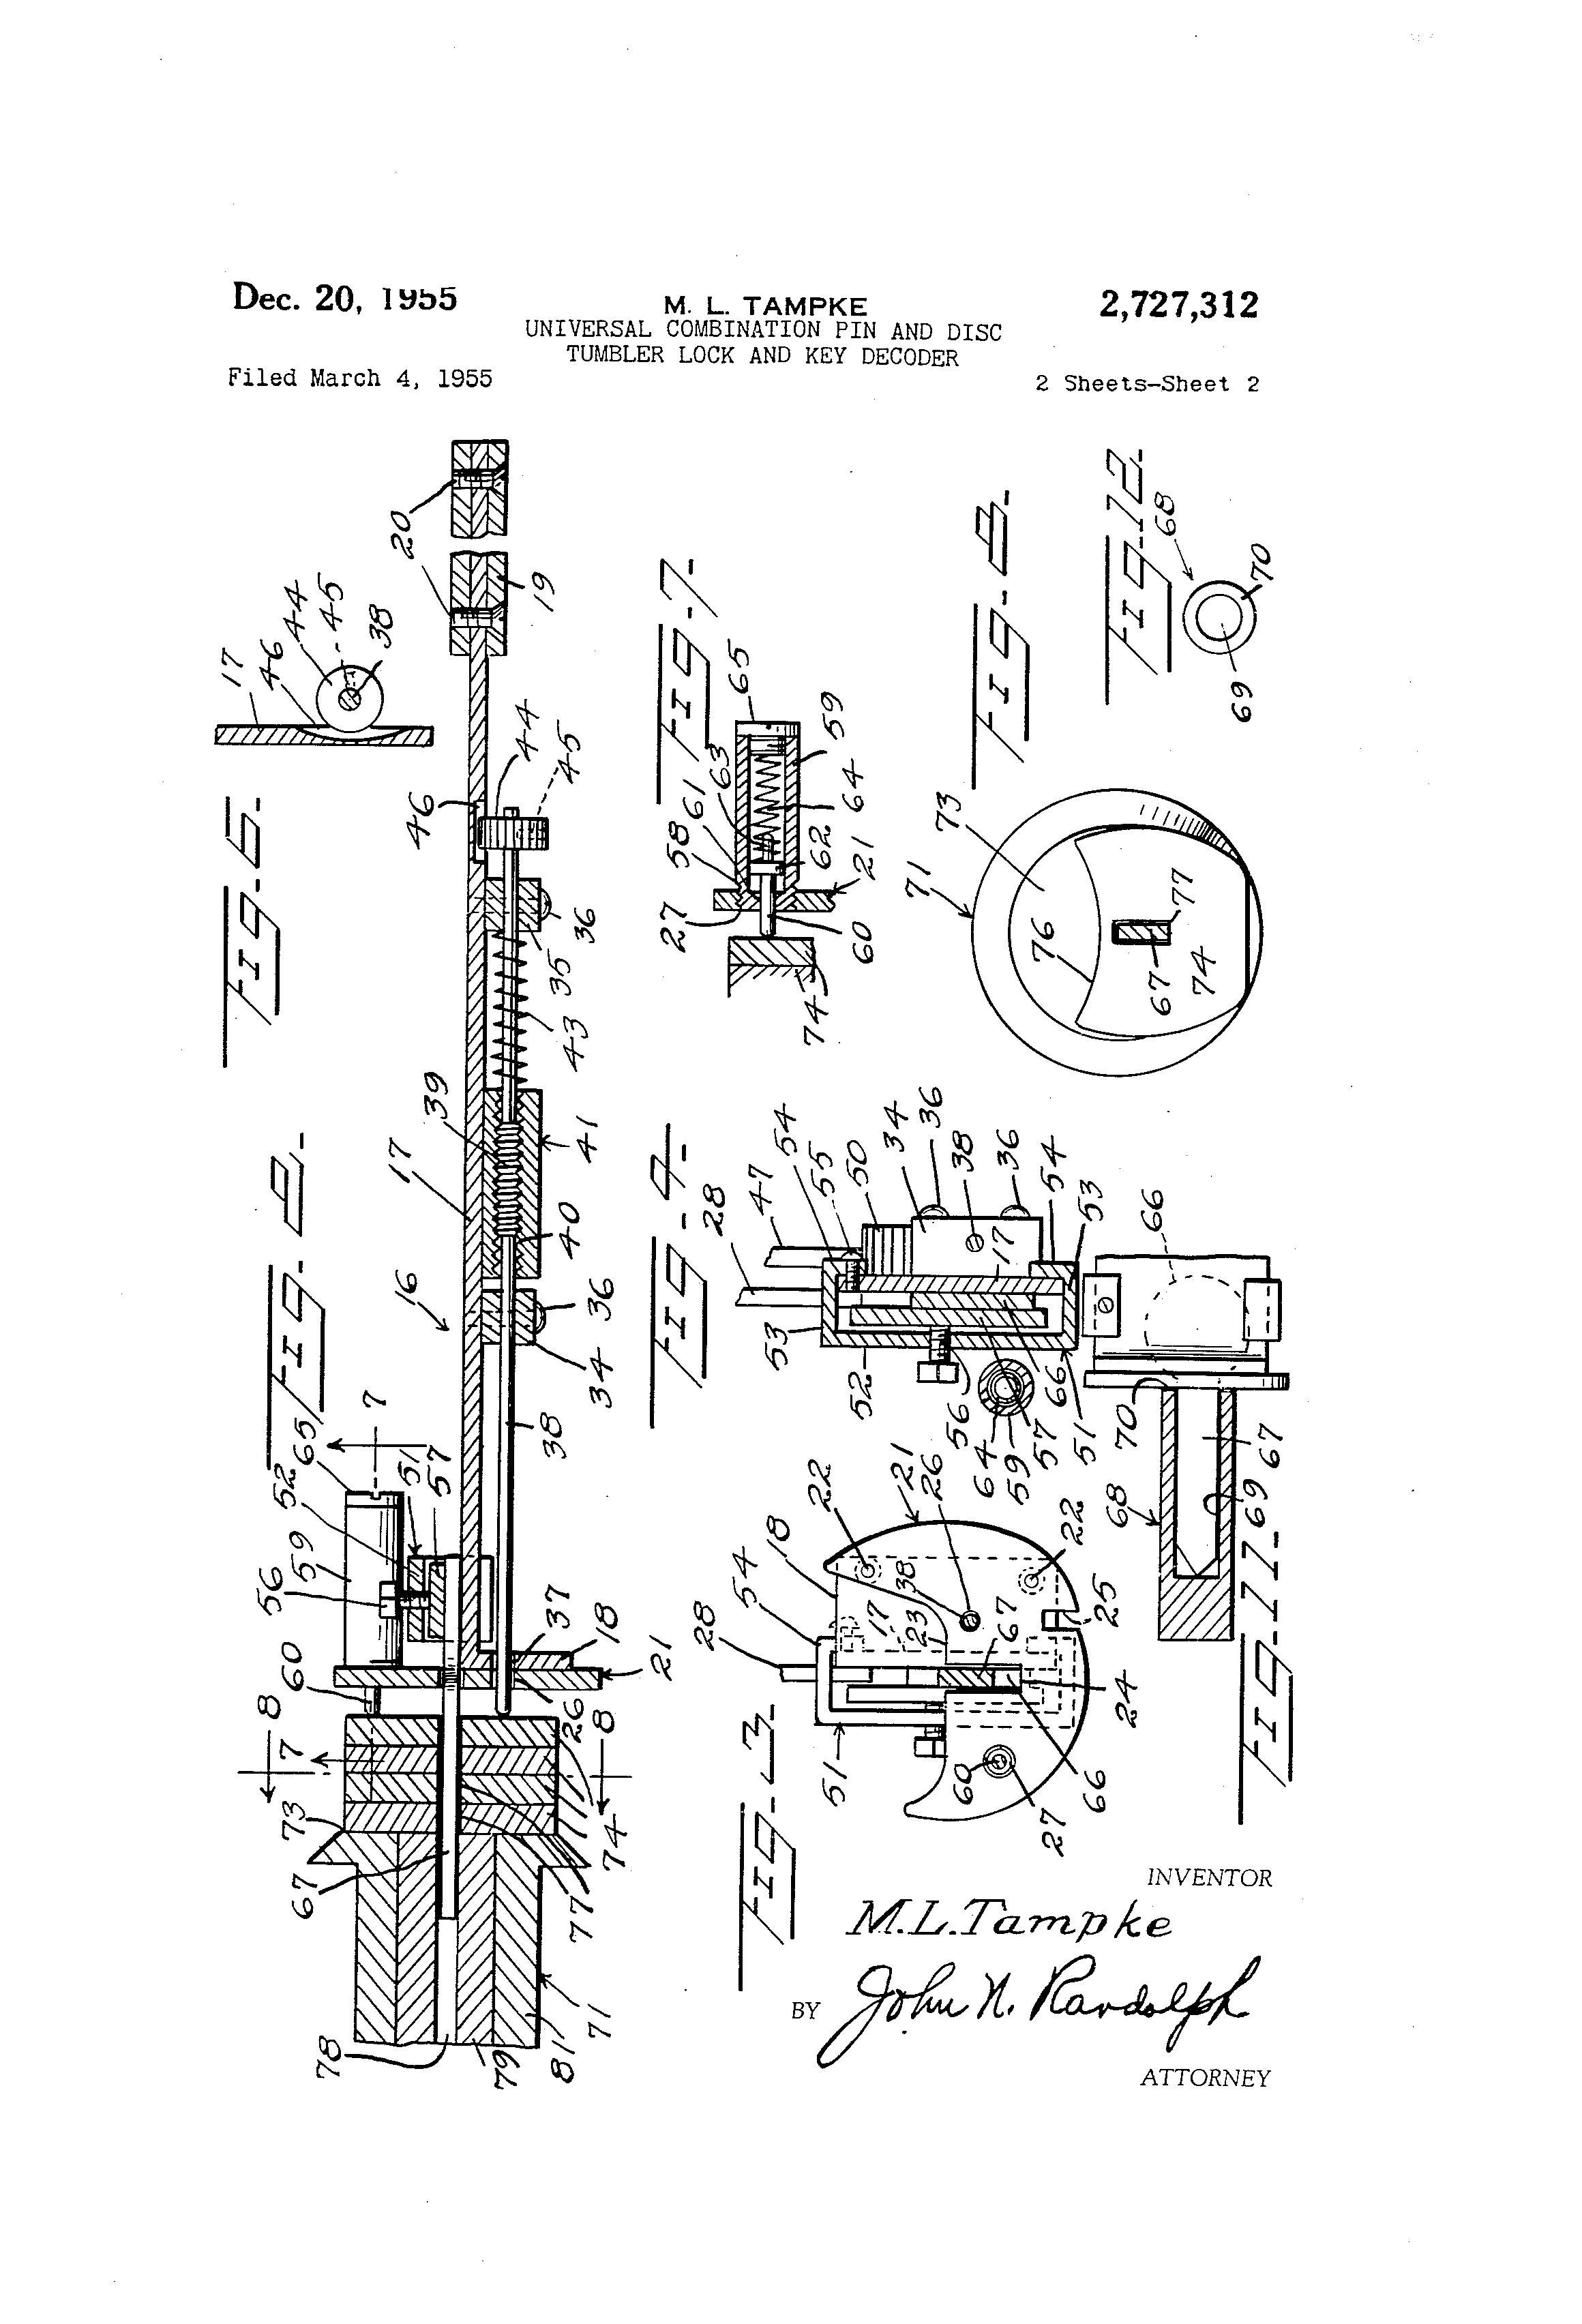 Disc Tumbler Lock Diagram Modern Design Of Wiring Picking Brevet Us2727312 Universal Combination Pin And Rh Google Dj Pick